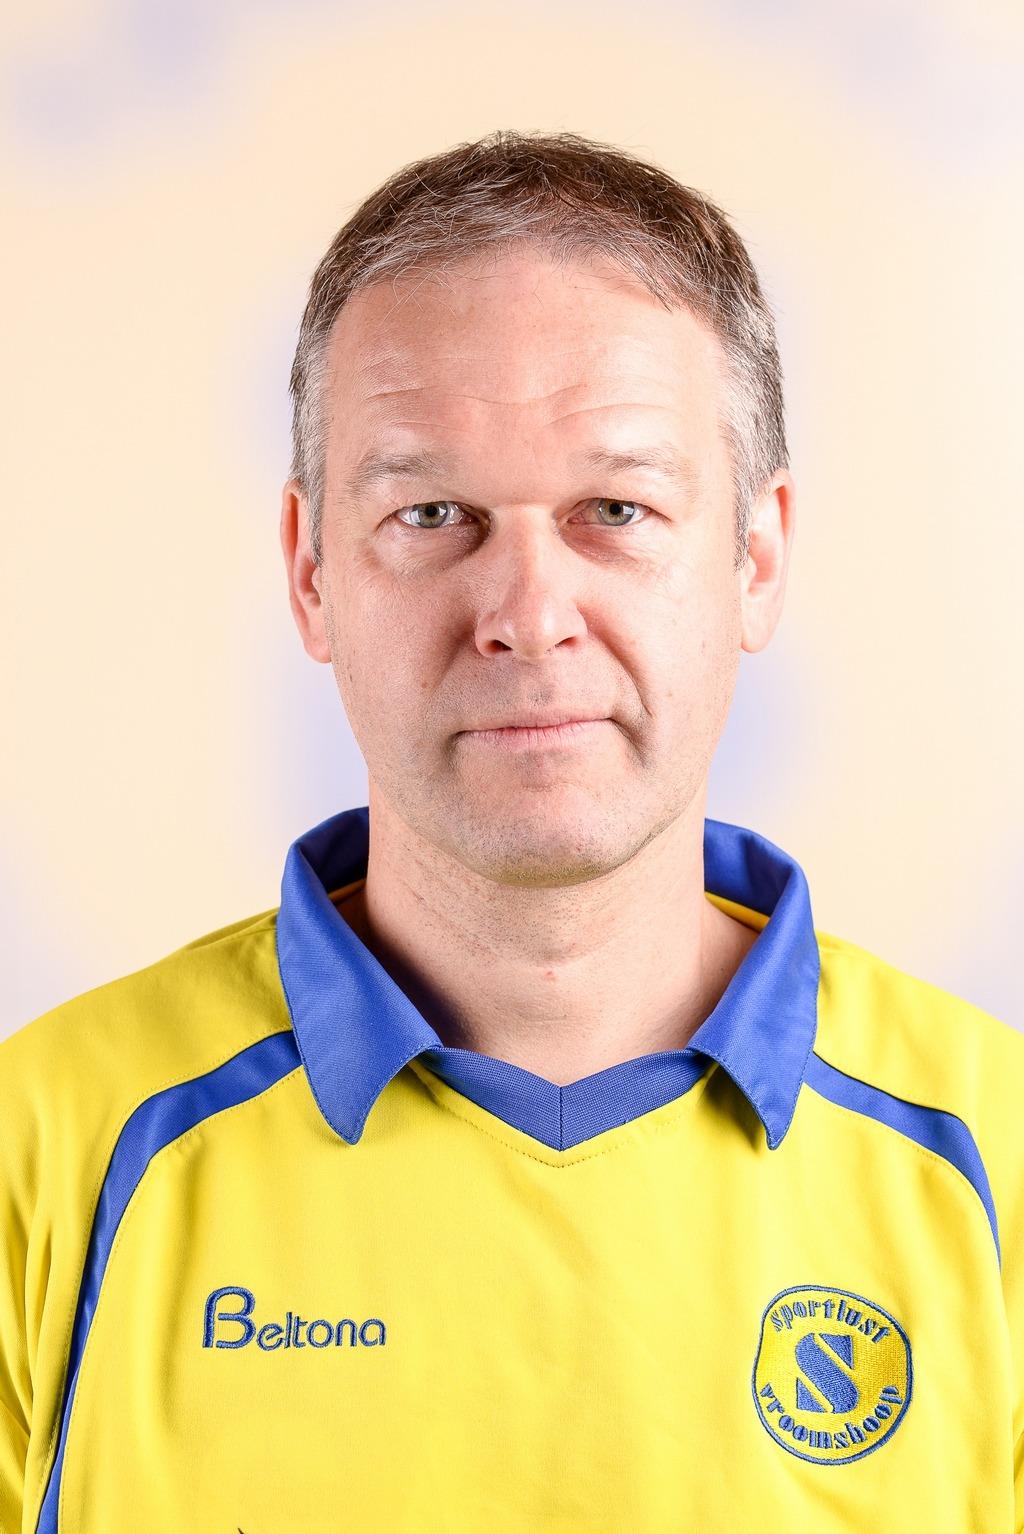 Marc Wekamp